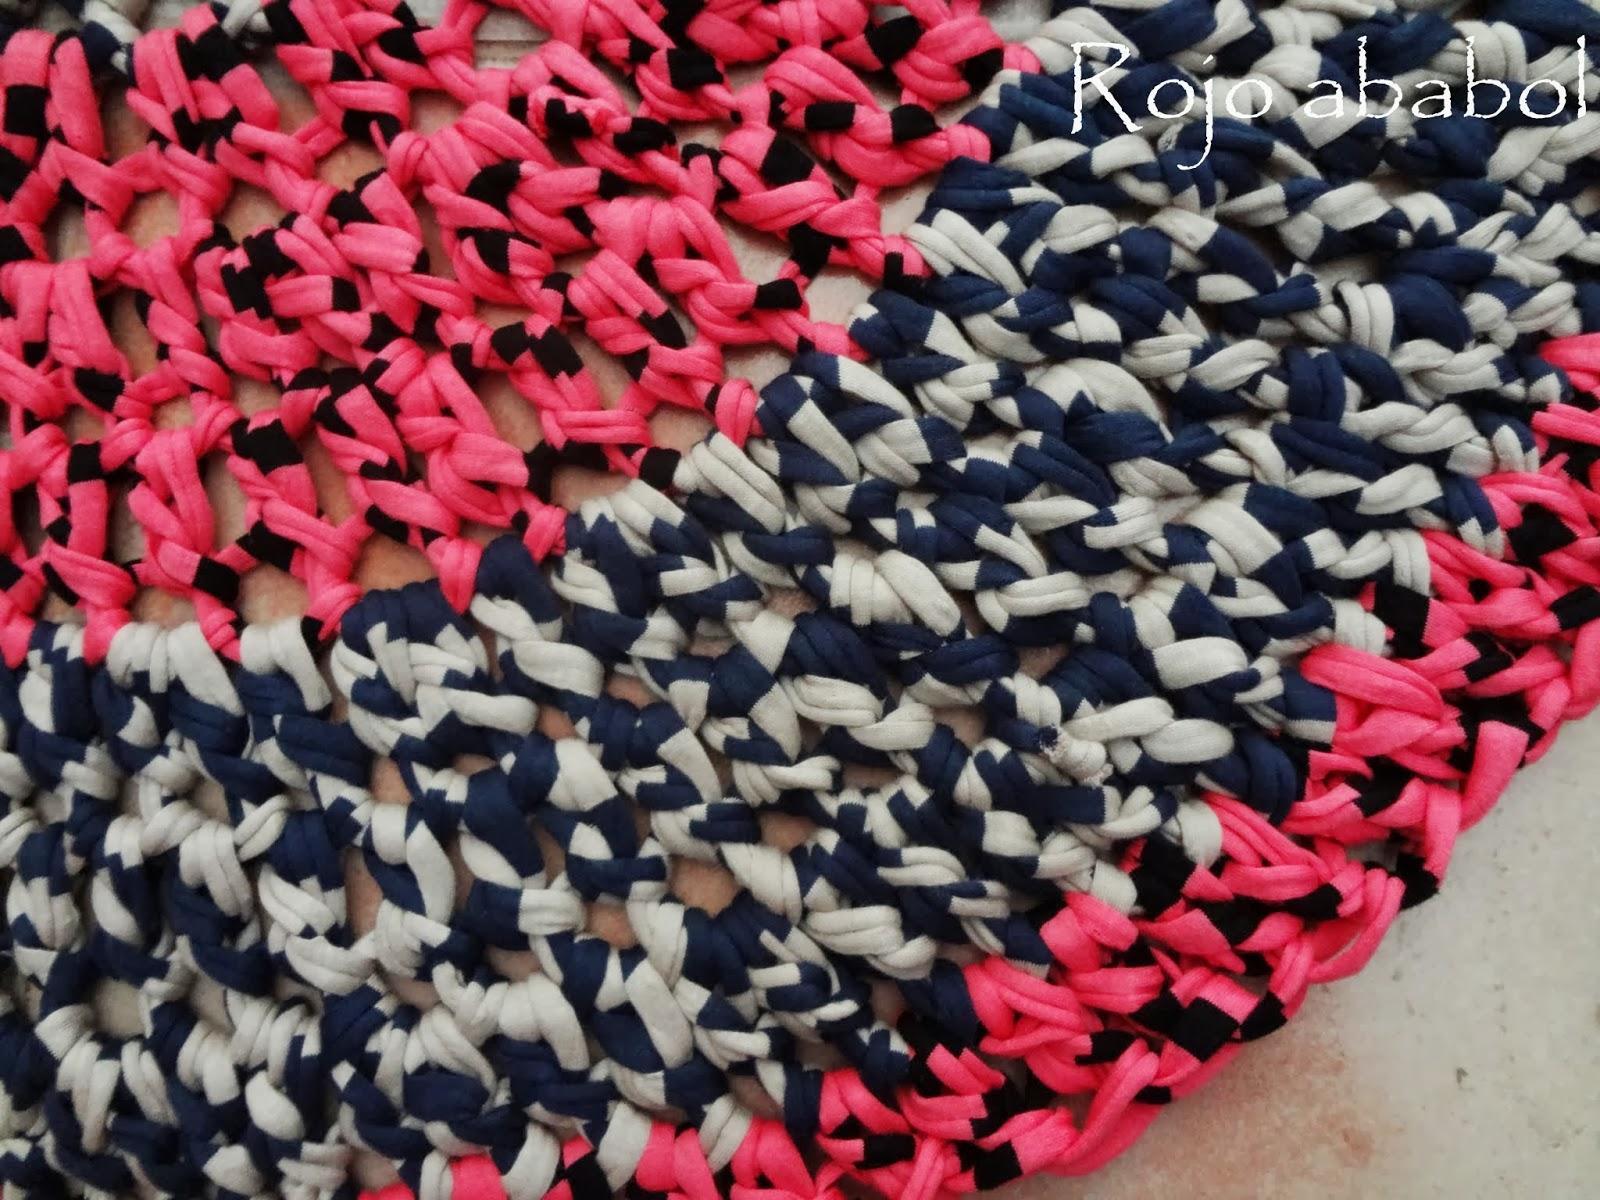 Rojo ababol alfombra de trapillo - Alfombra de trapillo cuadrada ...